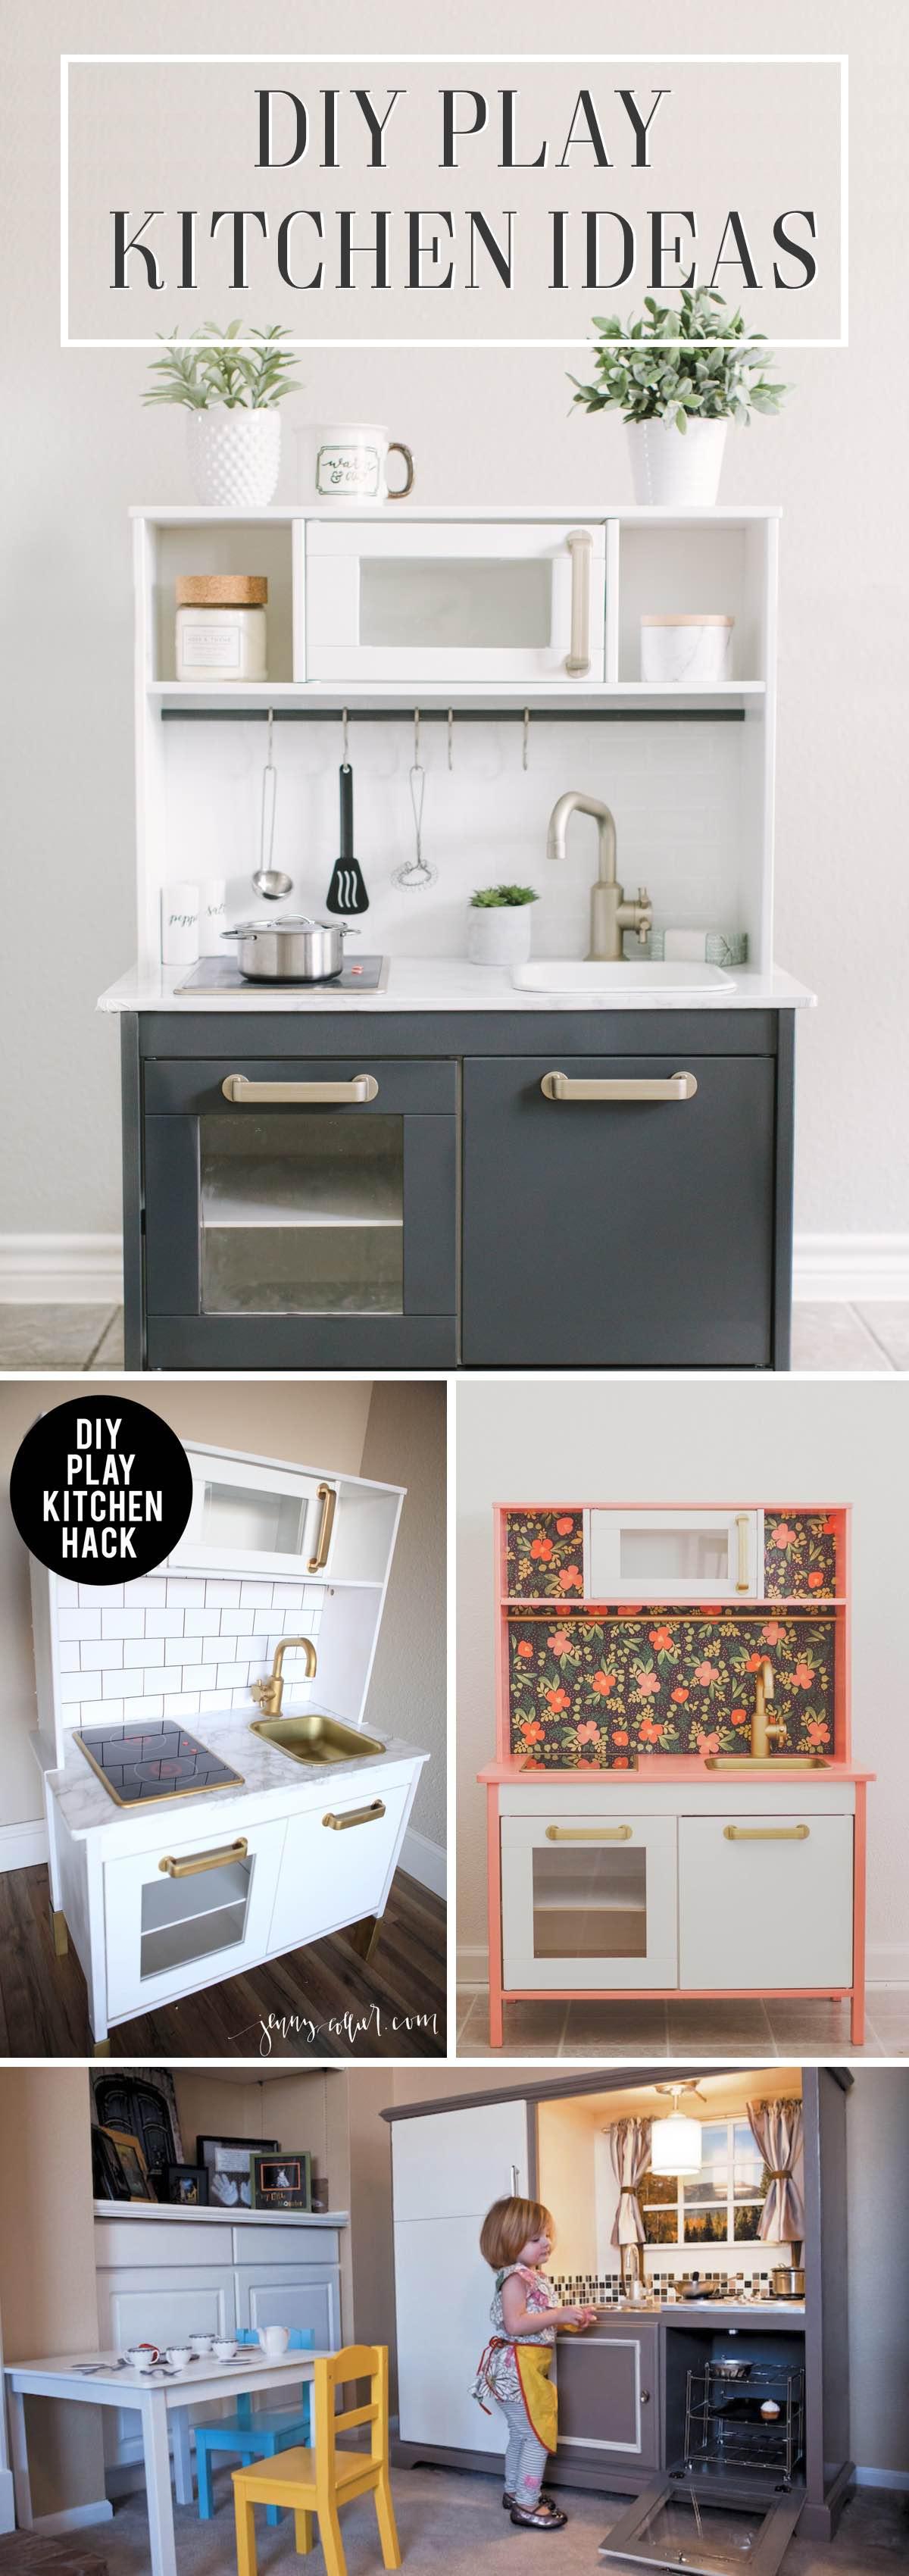 DIY Play Kitchen Ideas